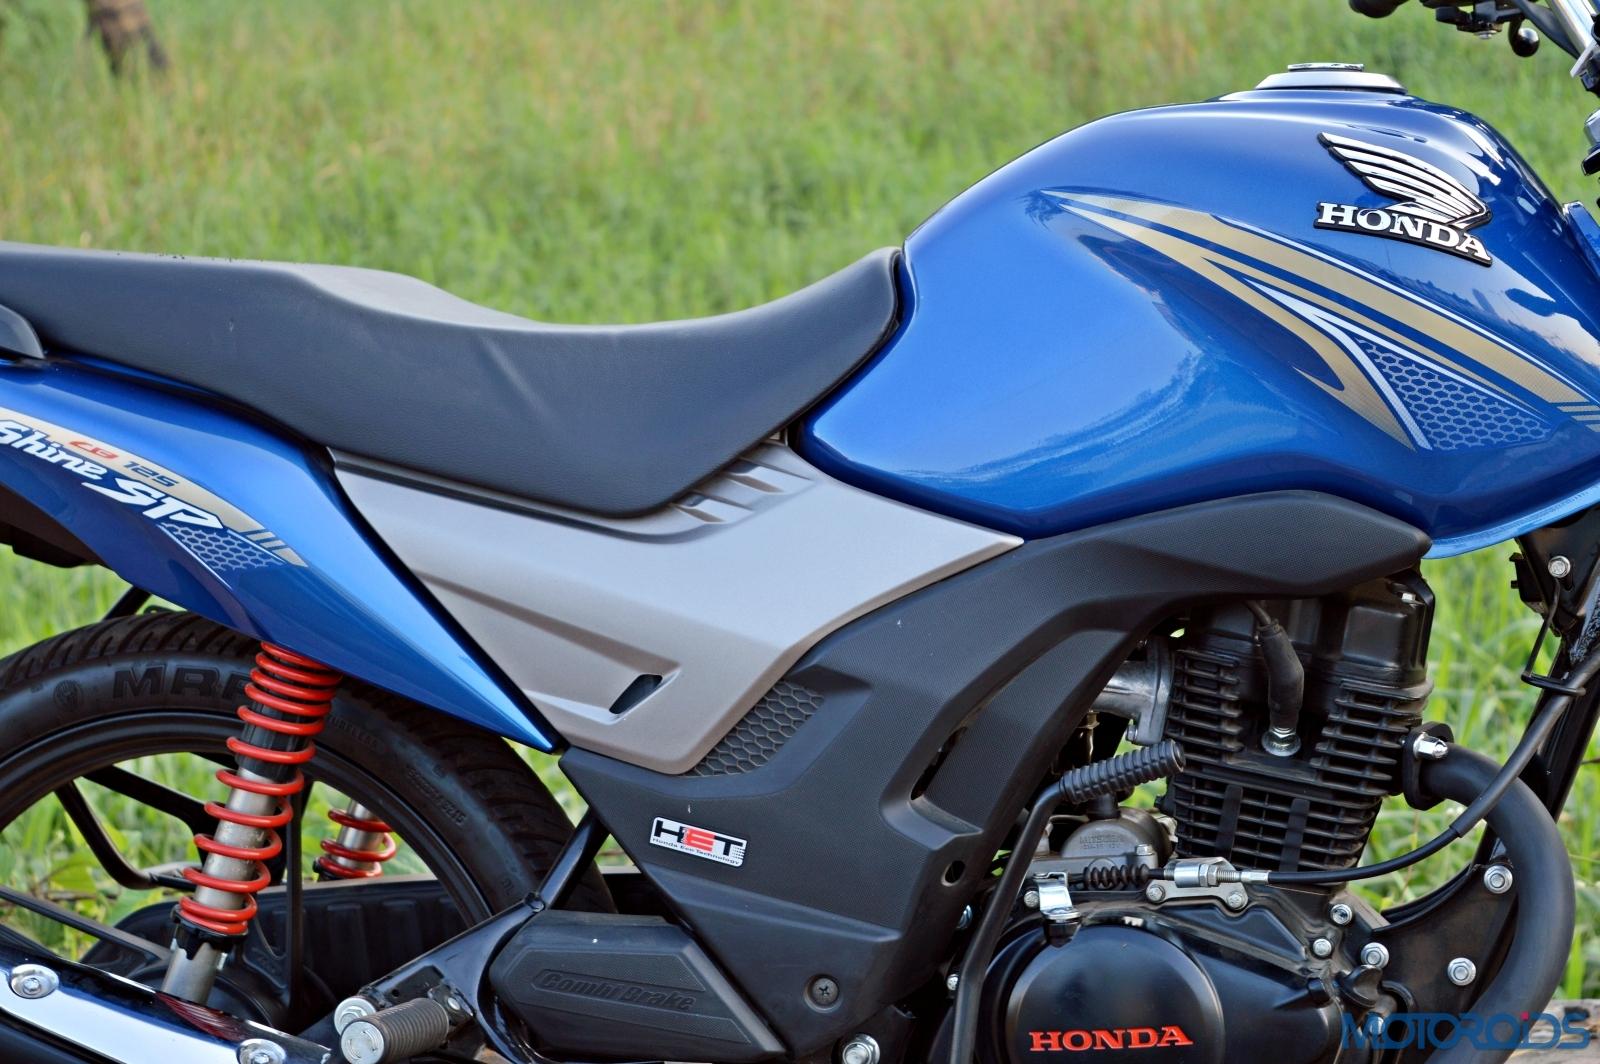 Honda Cb Shine 125 Sp Review Decked Up Diligence Motoroids